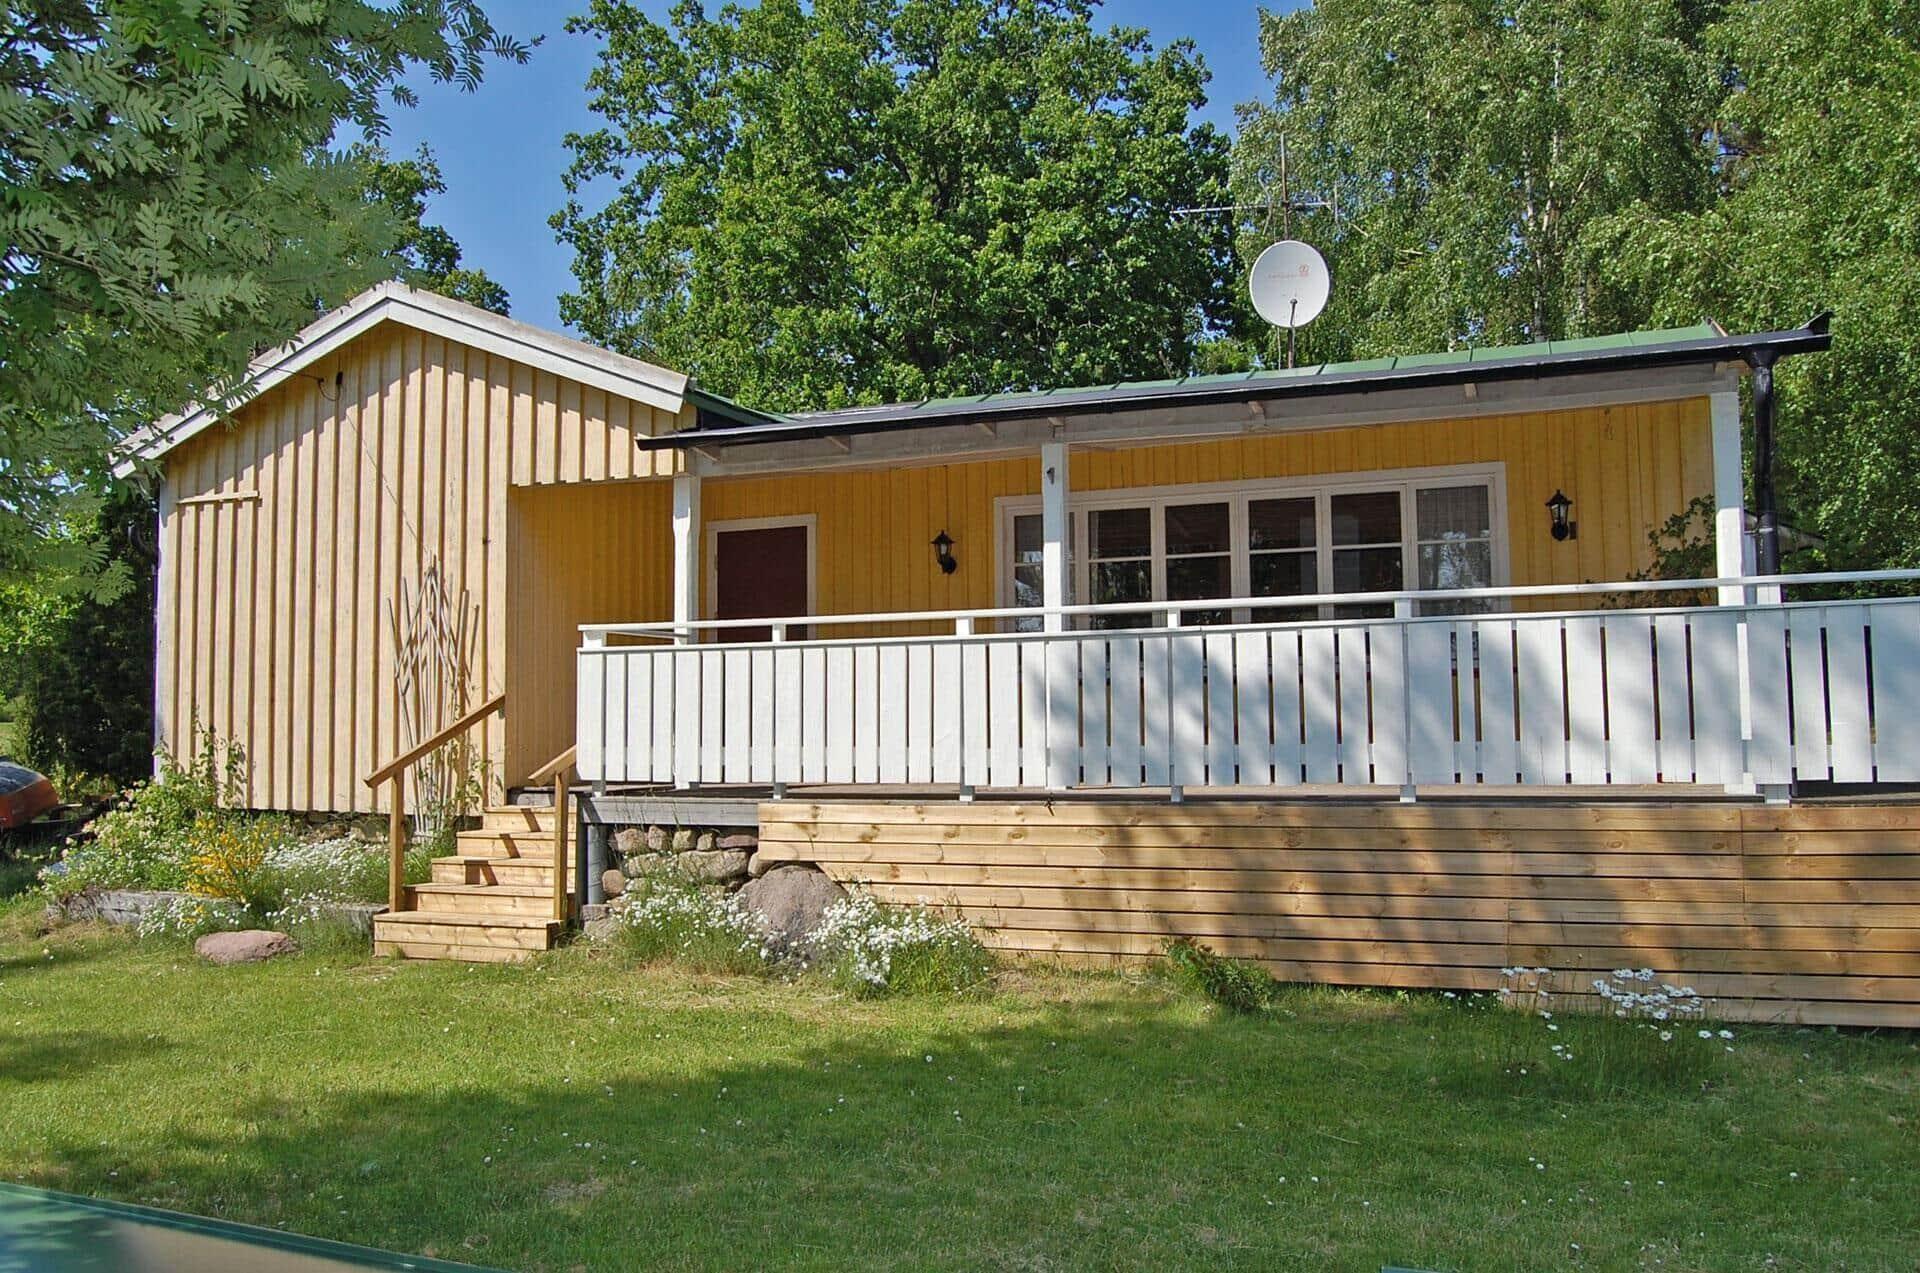 Bild 1-171 Stuga OST143, Nyttorp 607, DK - 380 30 Rockneby